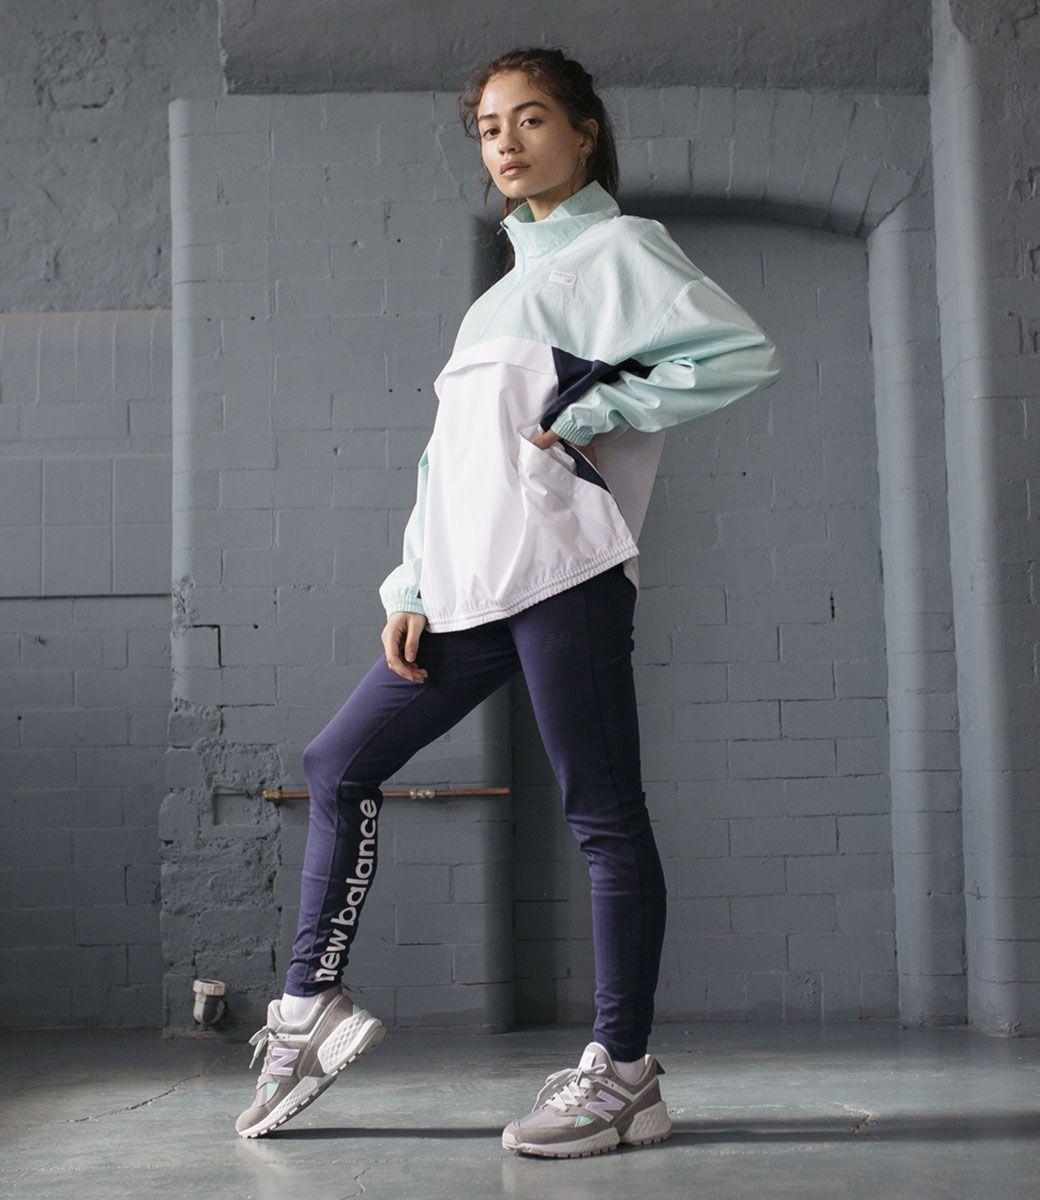 New Balance Women's 574 Sport Lifestyle Key Look,